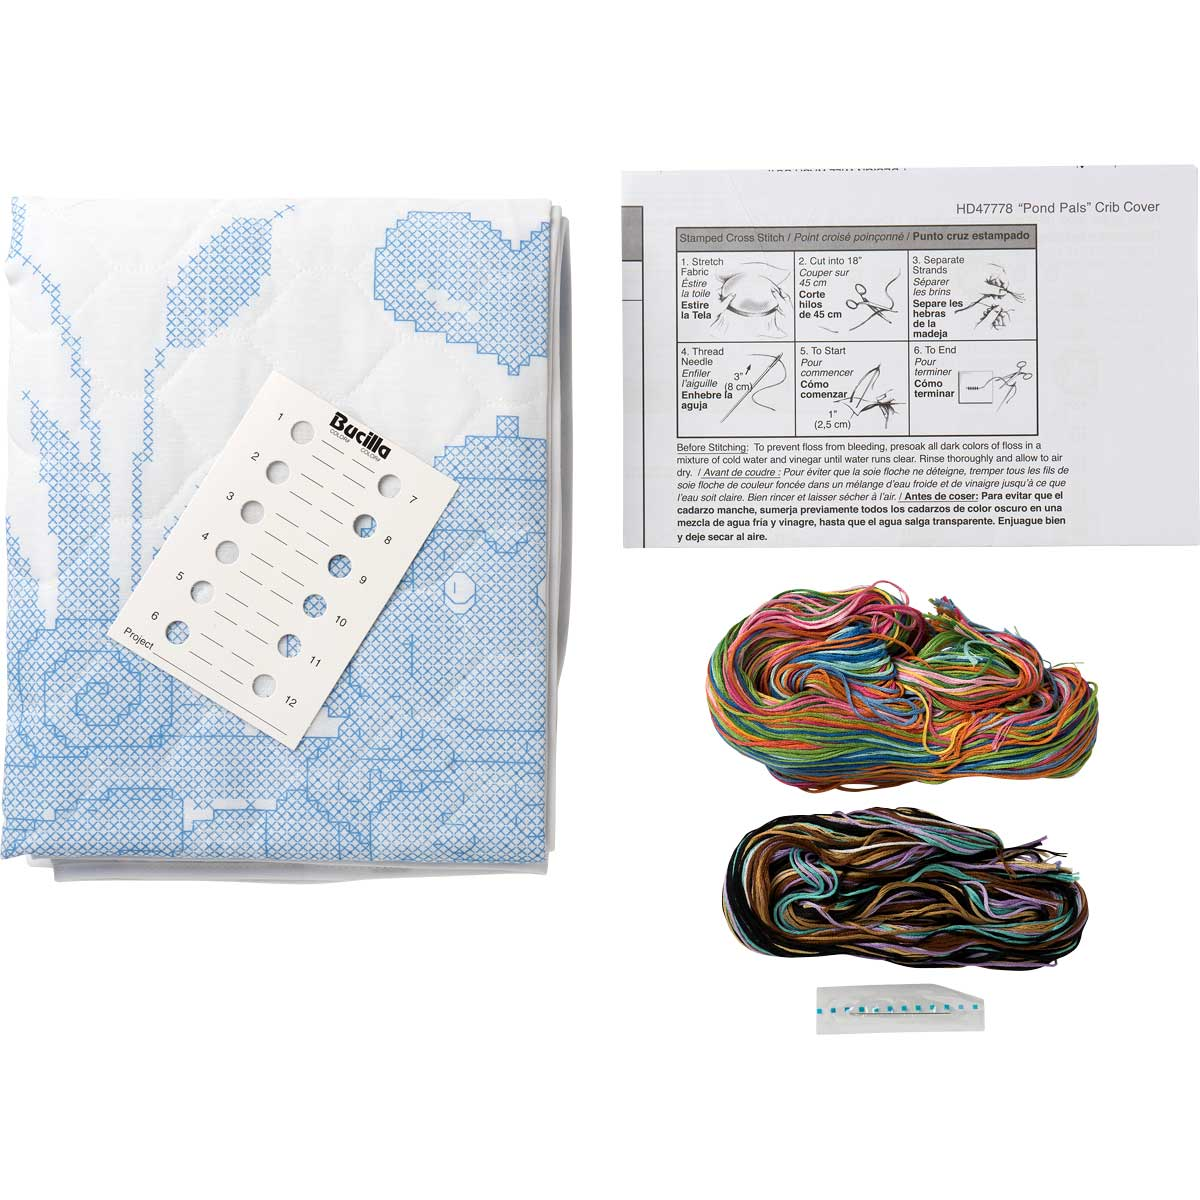 Bucilla ® Baby - Stamped Cross Stitch - Crib Ensembles - Pond Pals - Crib Cover